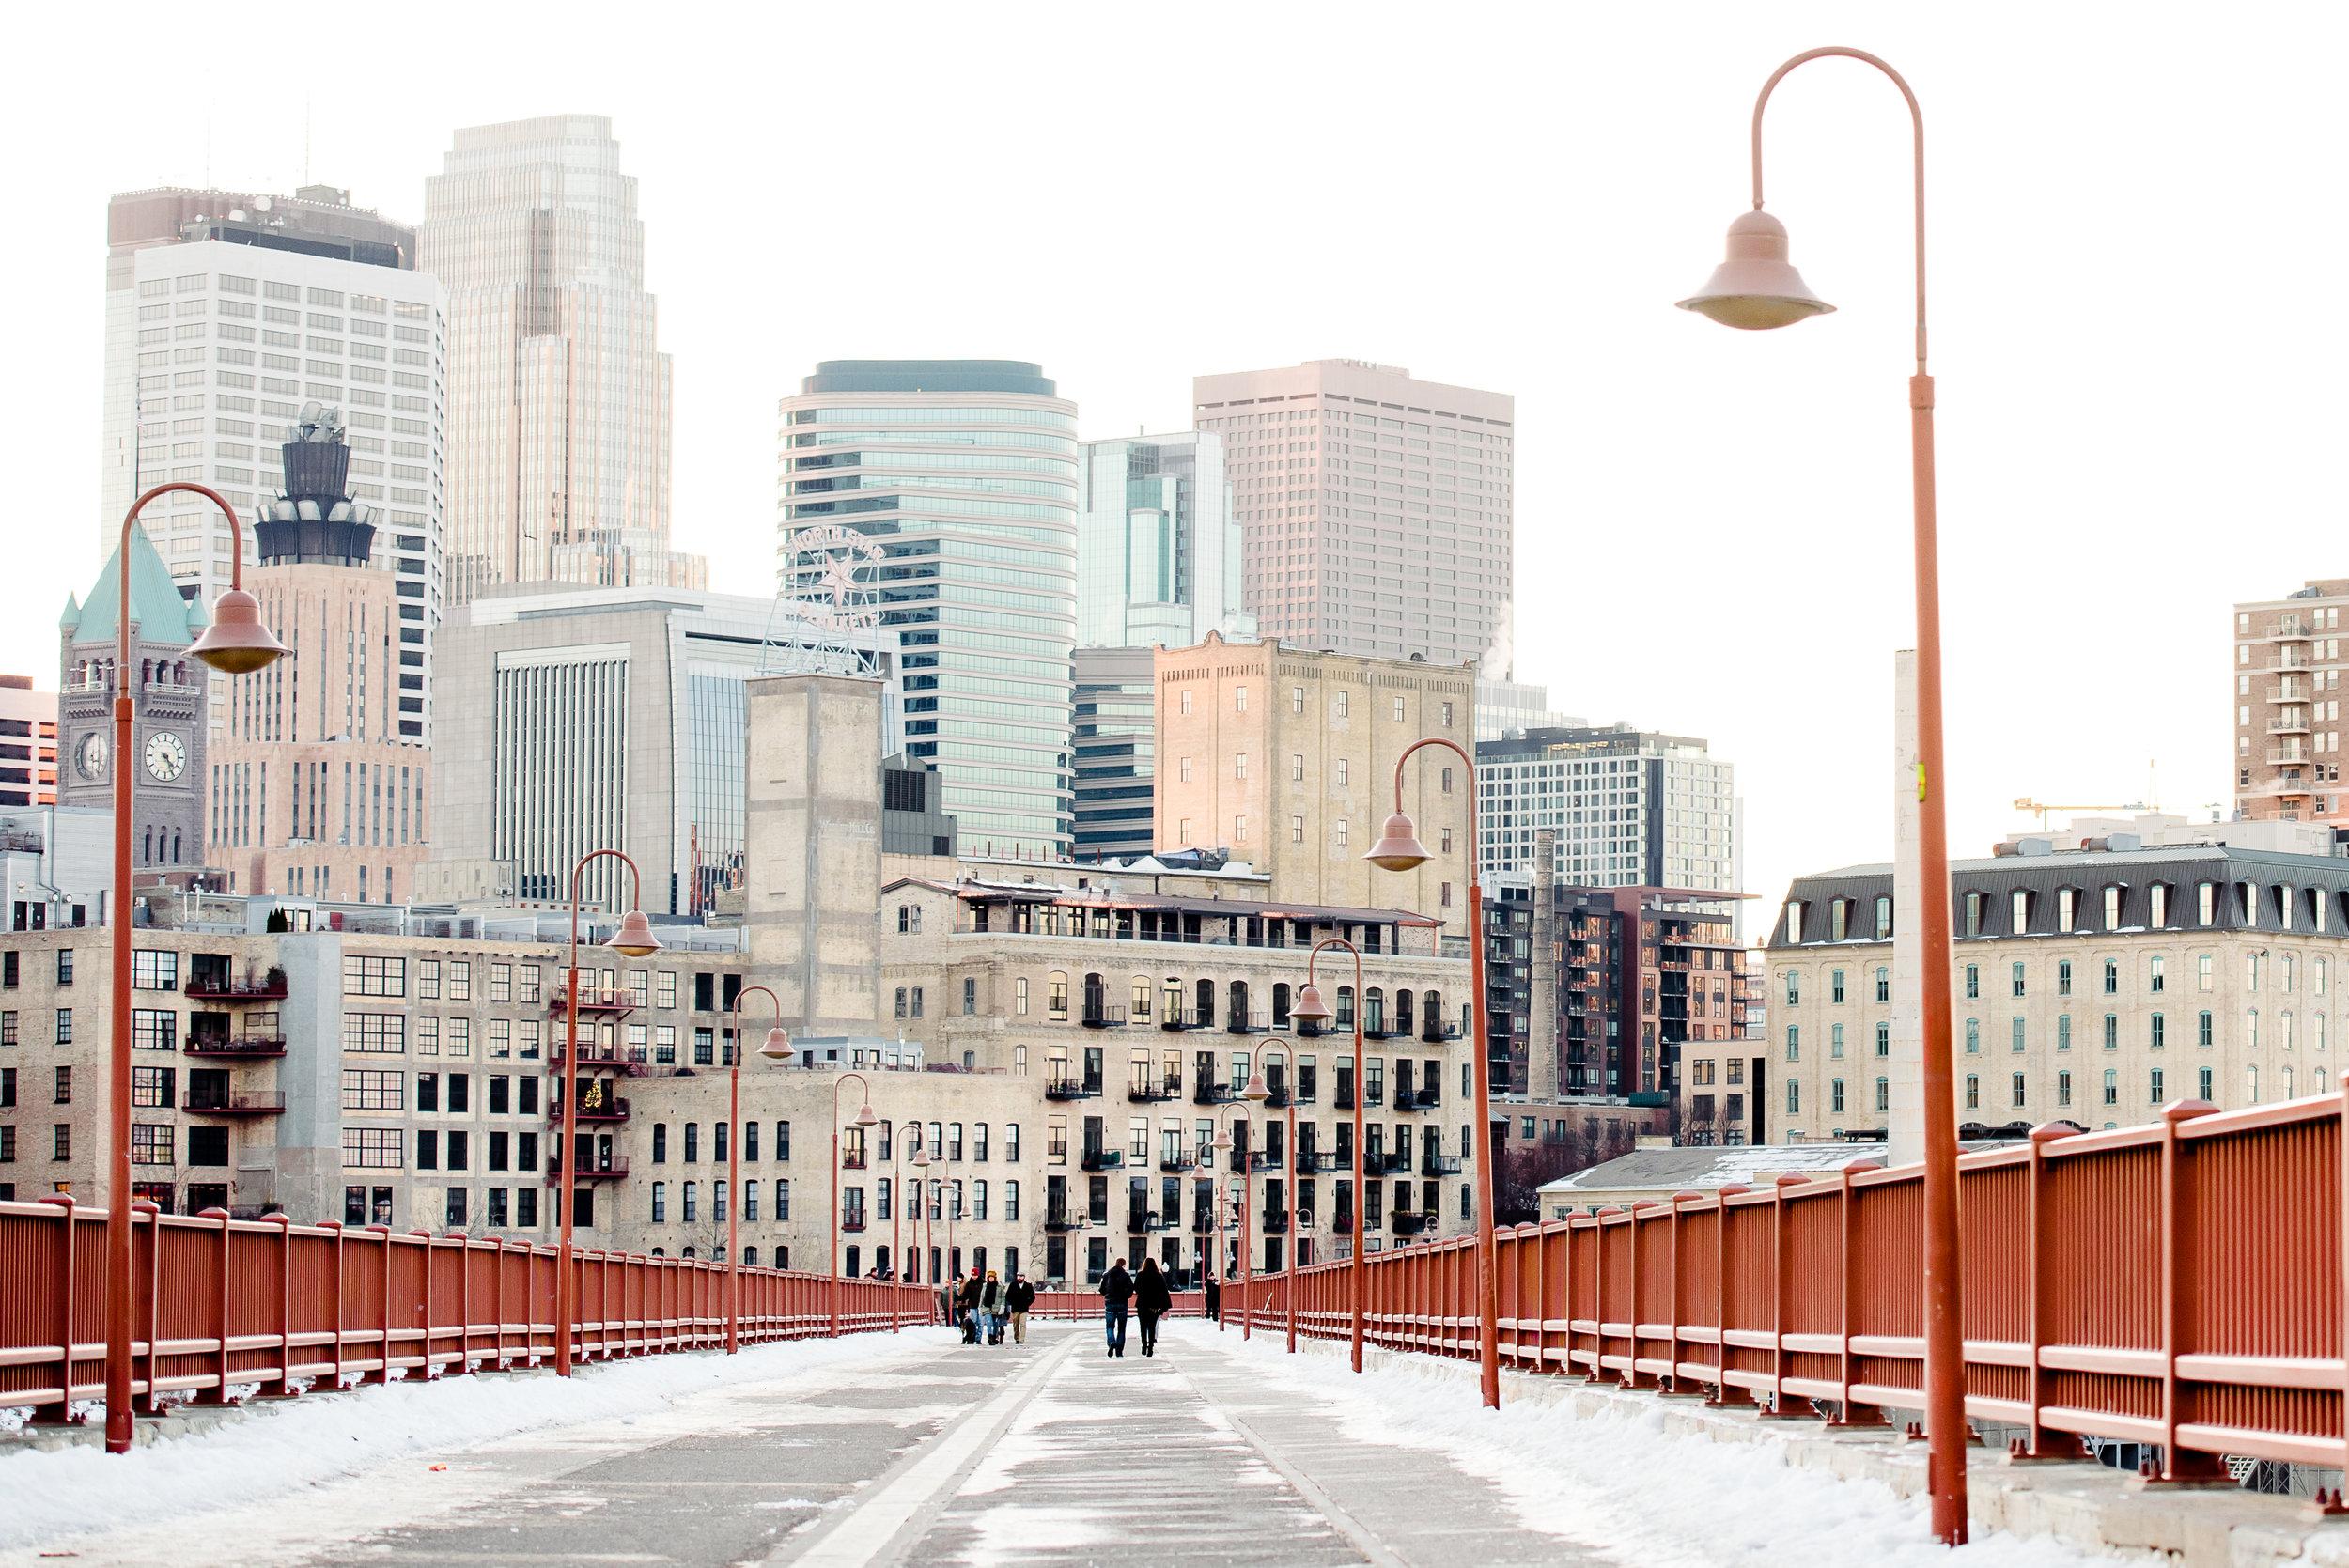 Proposal Ideas Twin Cities Minneapolis Stone Arch Bridge - Skyline View - Minneapolis Minnesota Surprise Proposal and Wedding Photographer